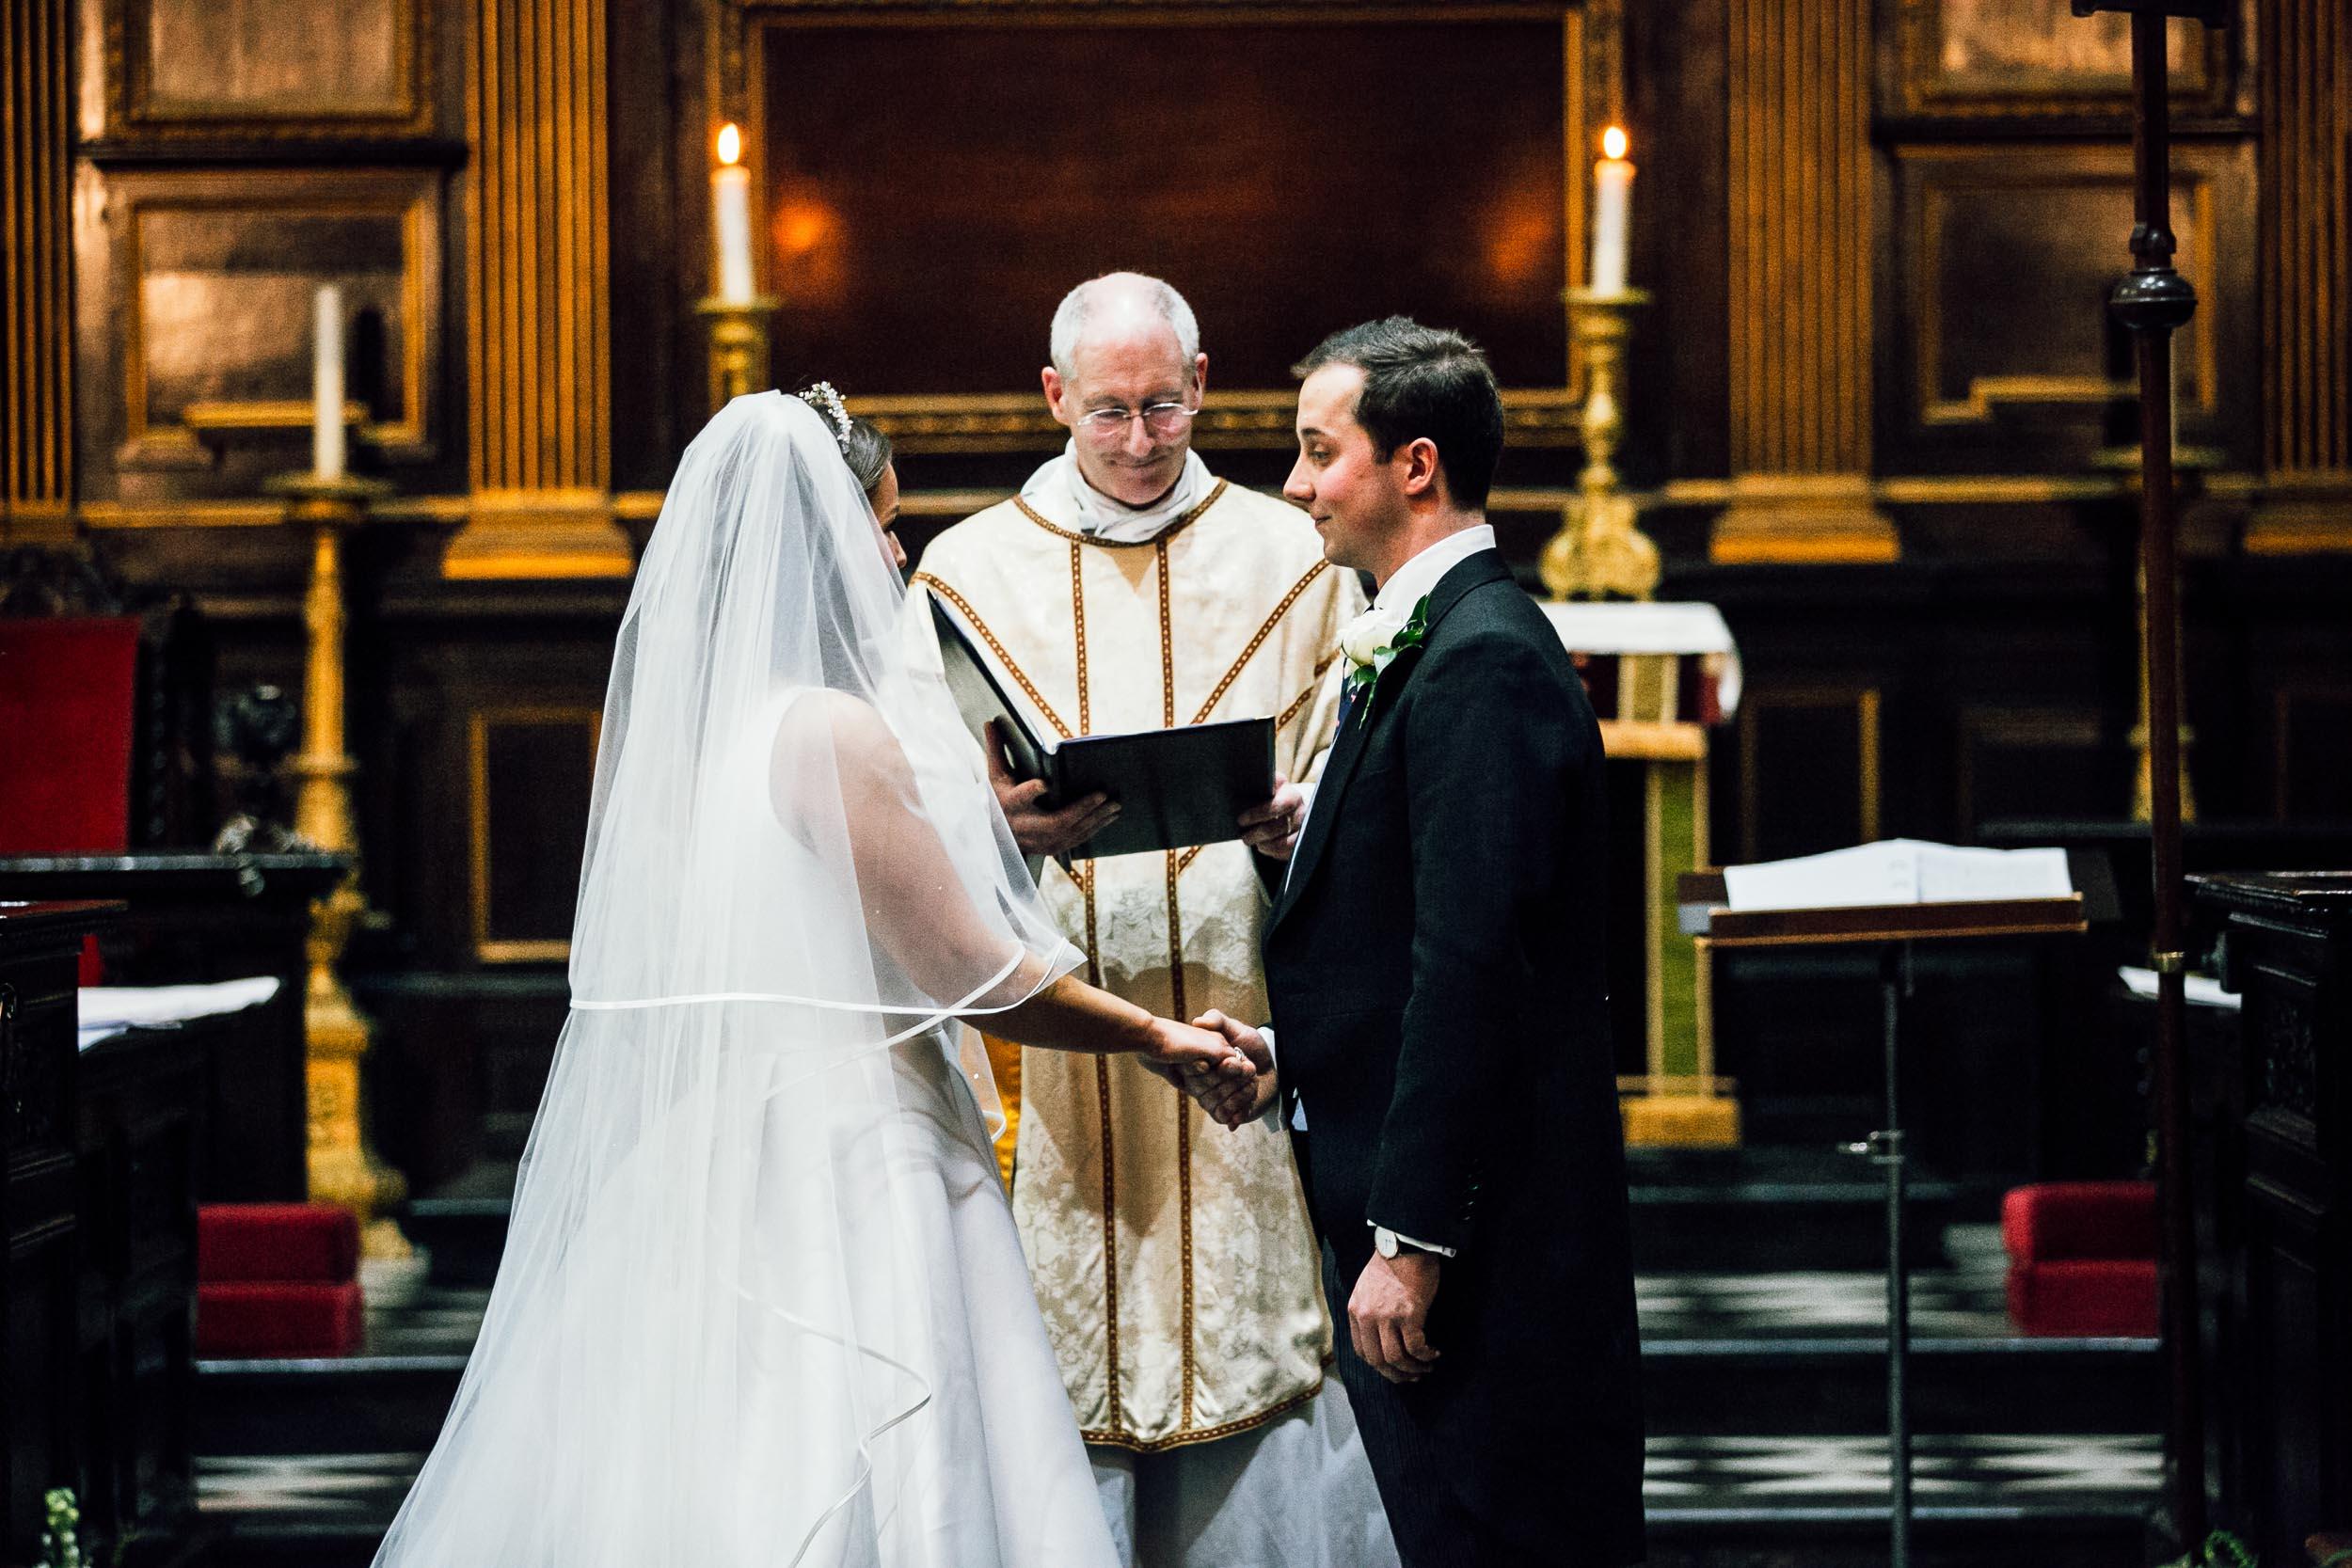 stationers-hall-wedding-photographer-london 038.jpg